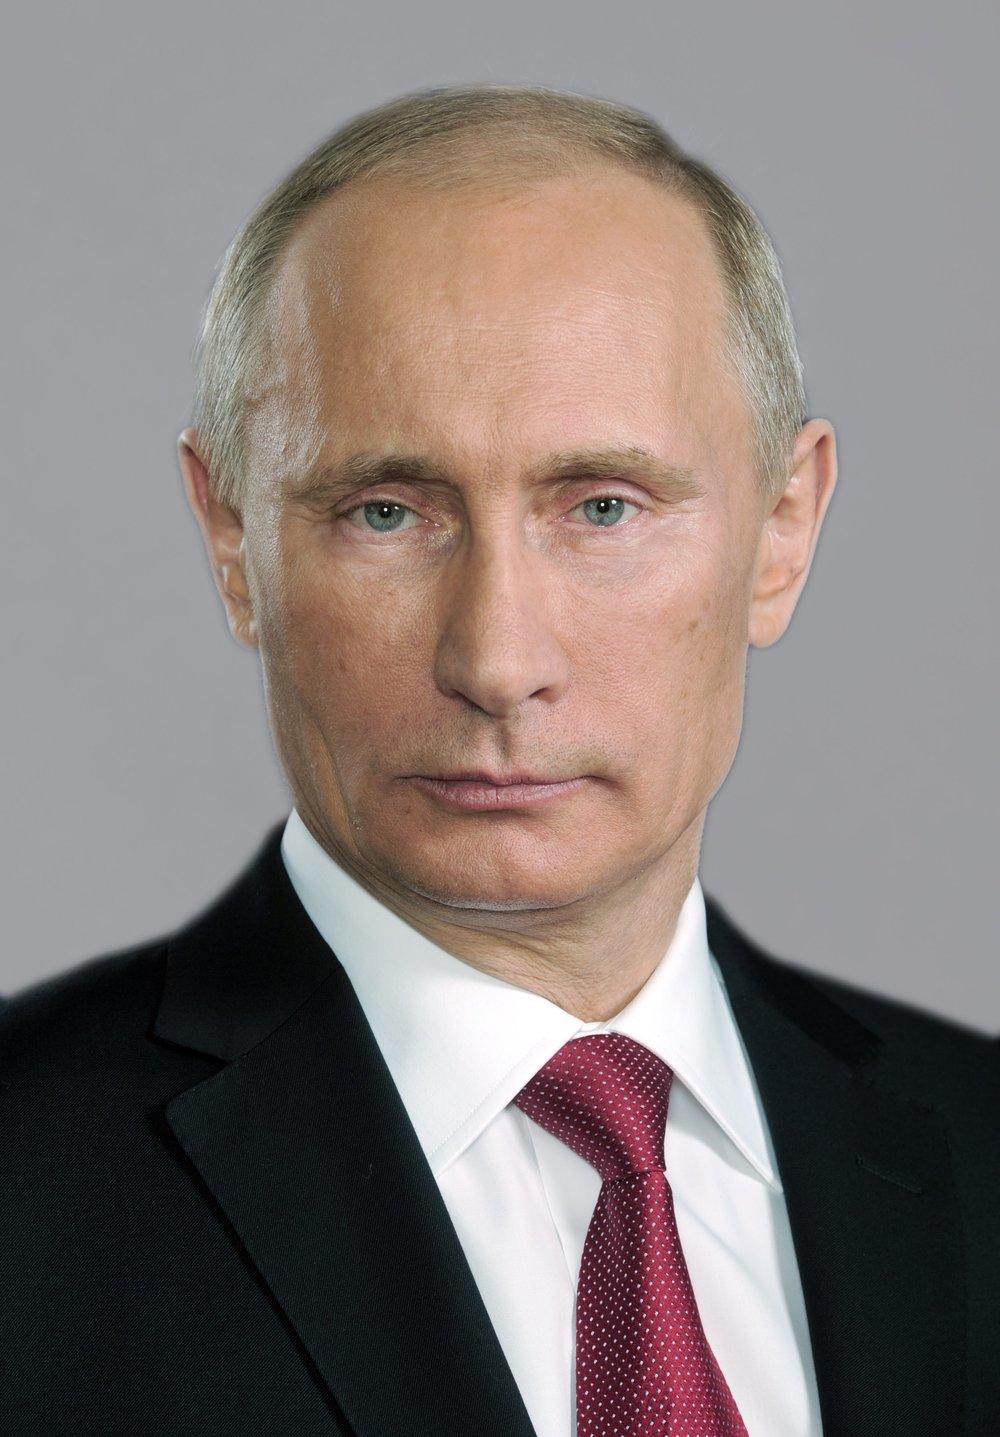 Image of Vladimir Putin